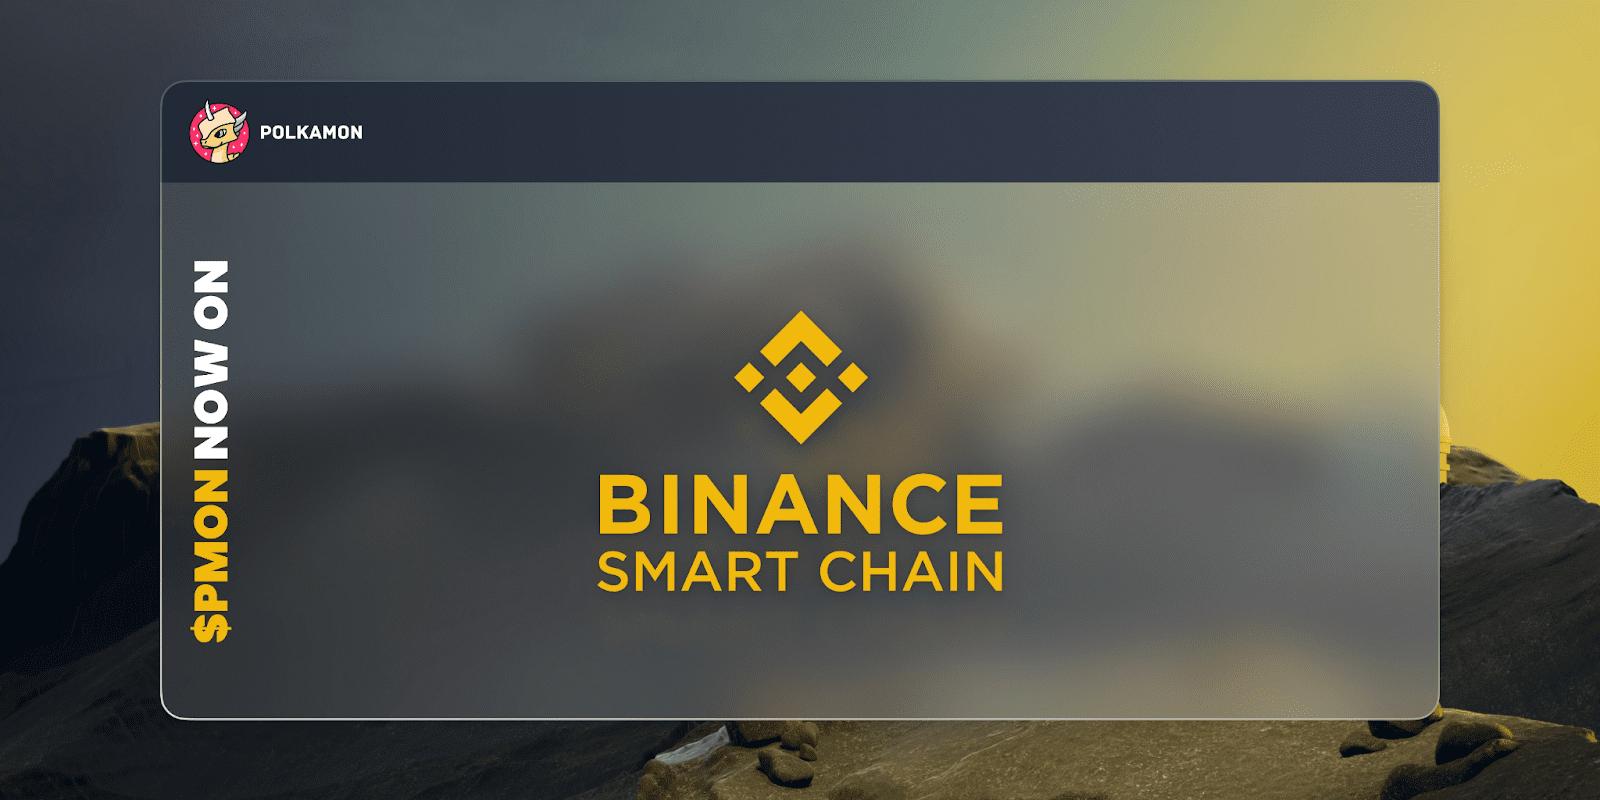 Polkamon on Binance Chain